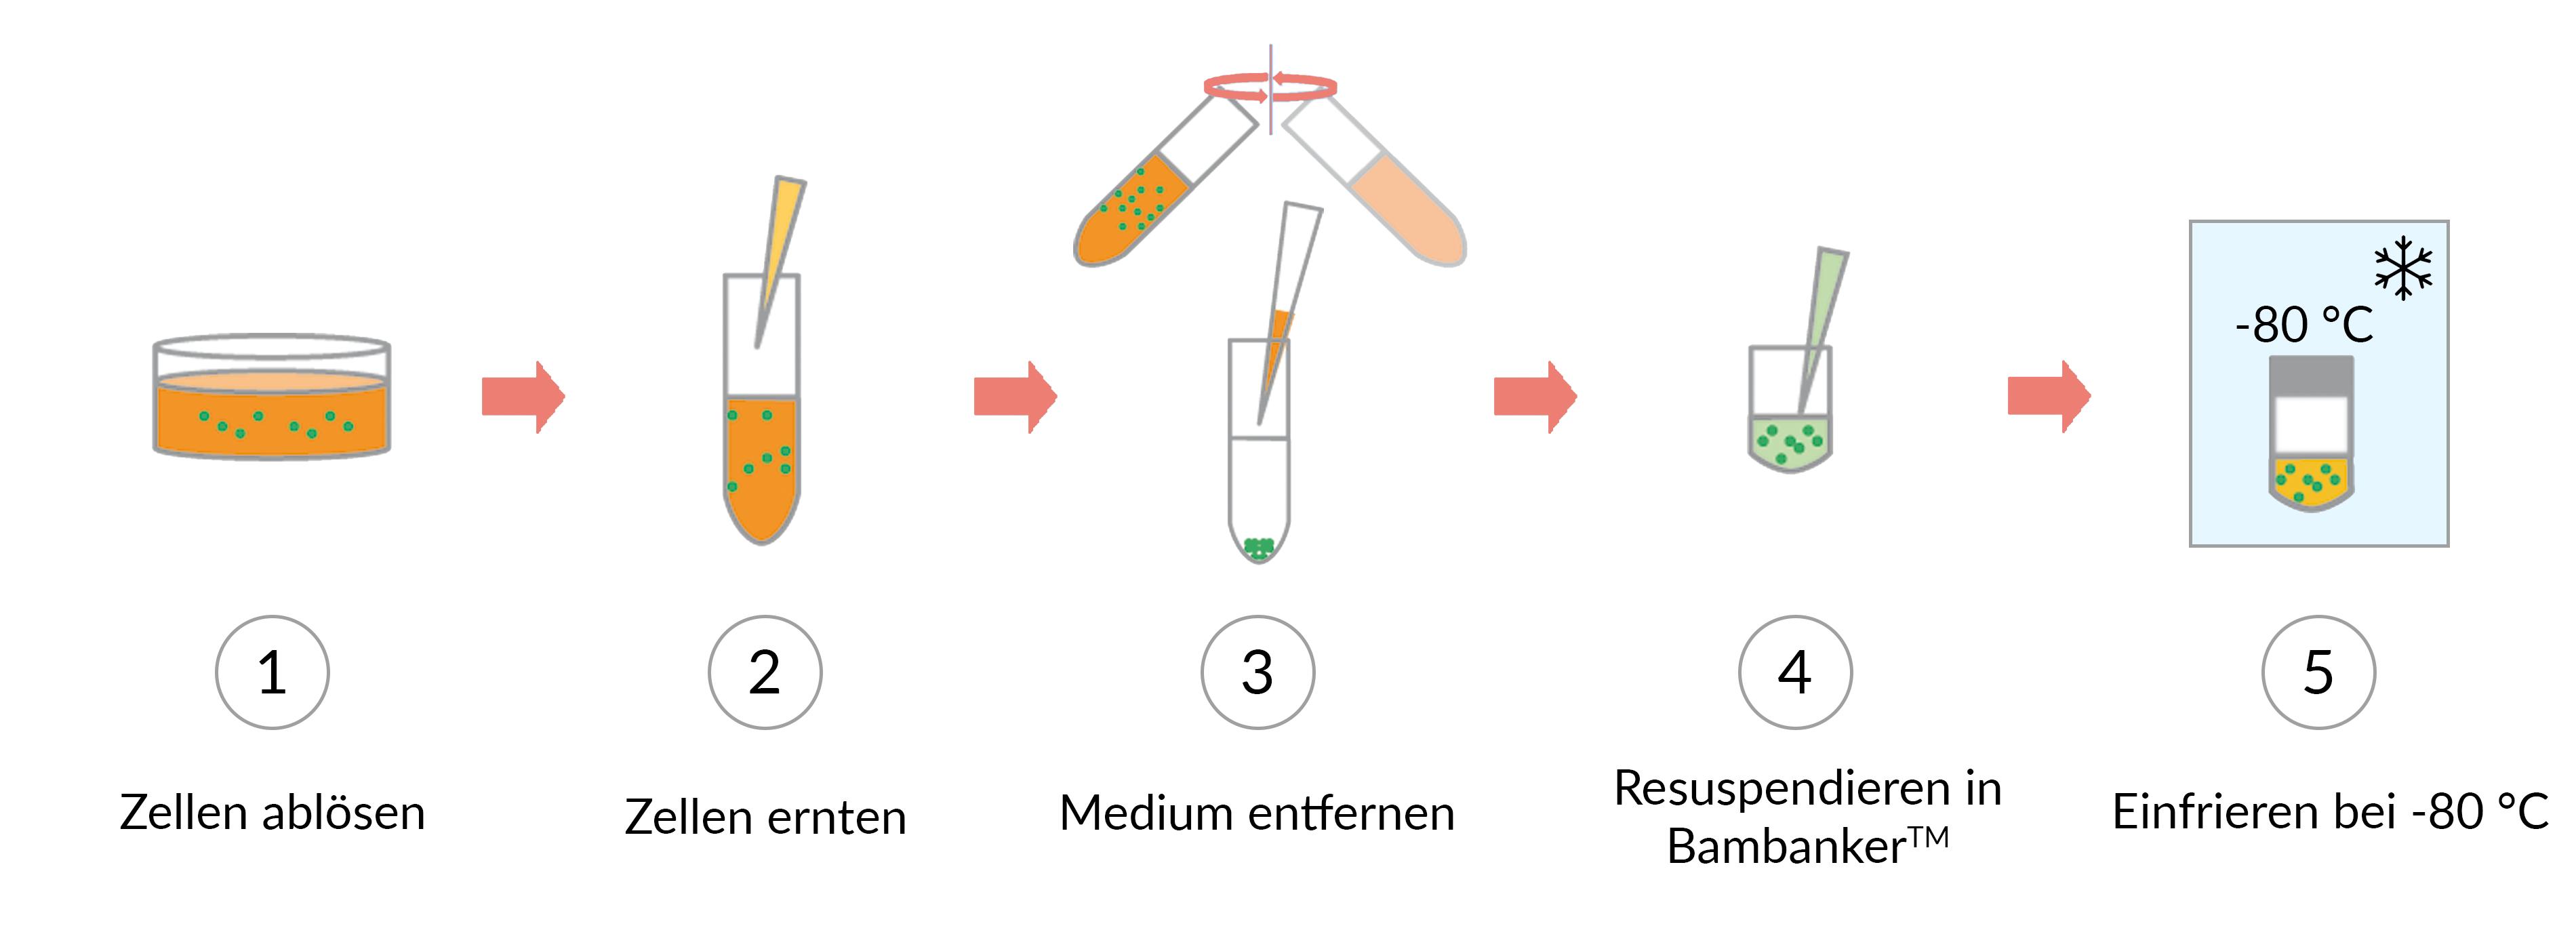 Bambanker workflow horizontal_text 2021-05-11_deutsch